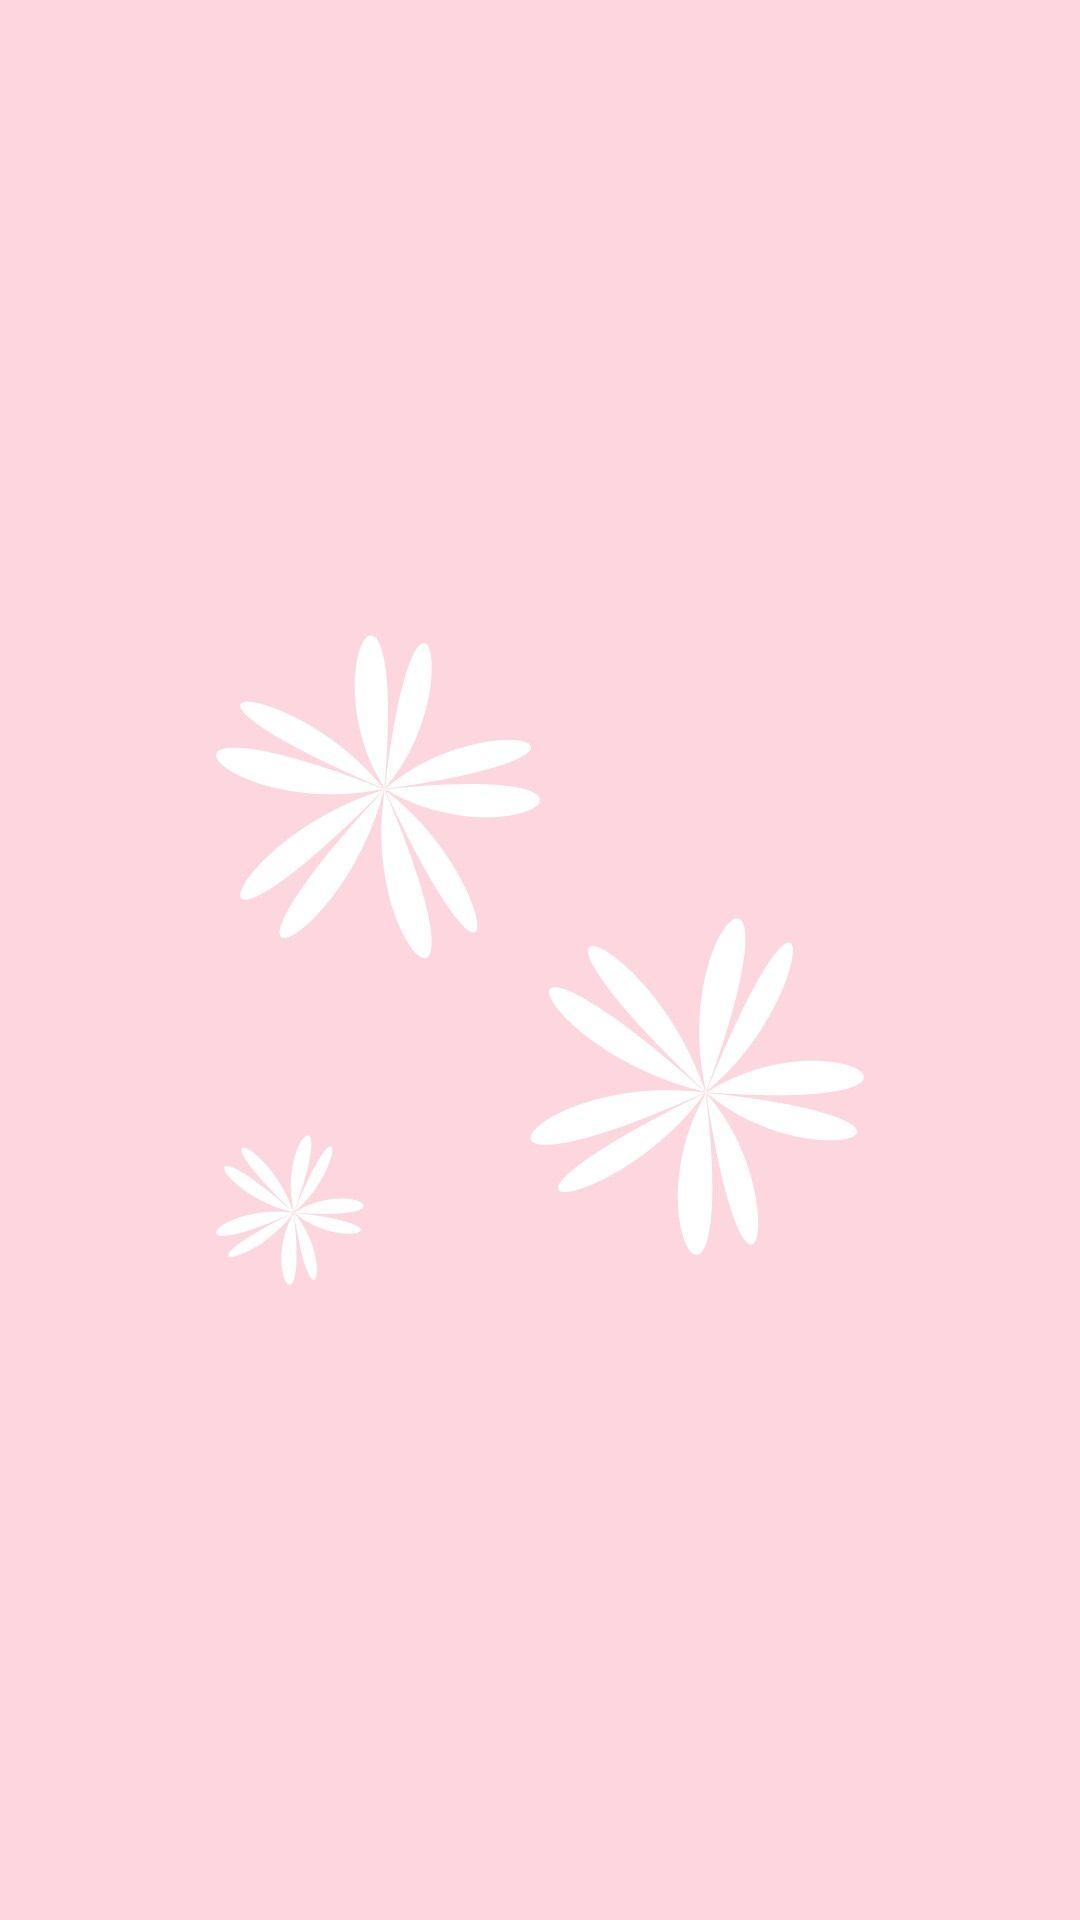 Fondos Rosa Pastel Fondos Rosa Pastel Fondos Color Rosa Fondos Color Rosa Pastel